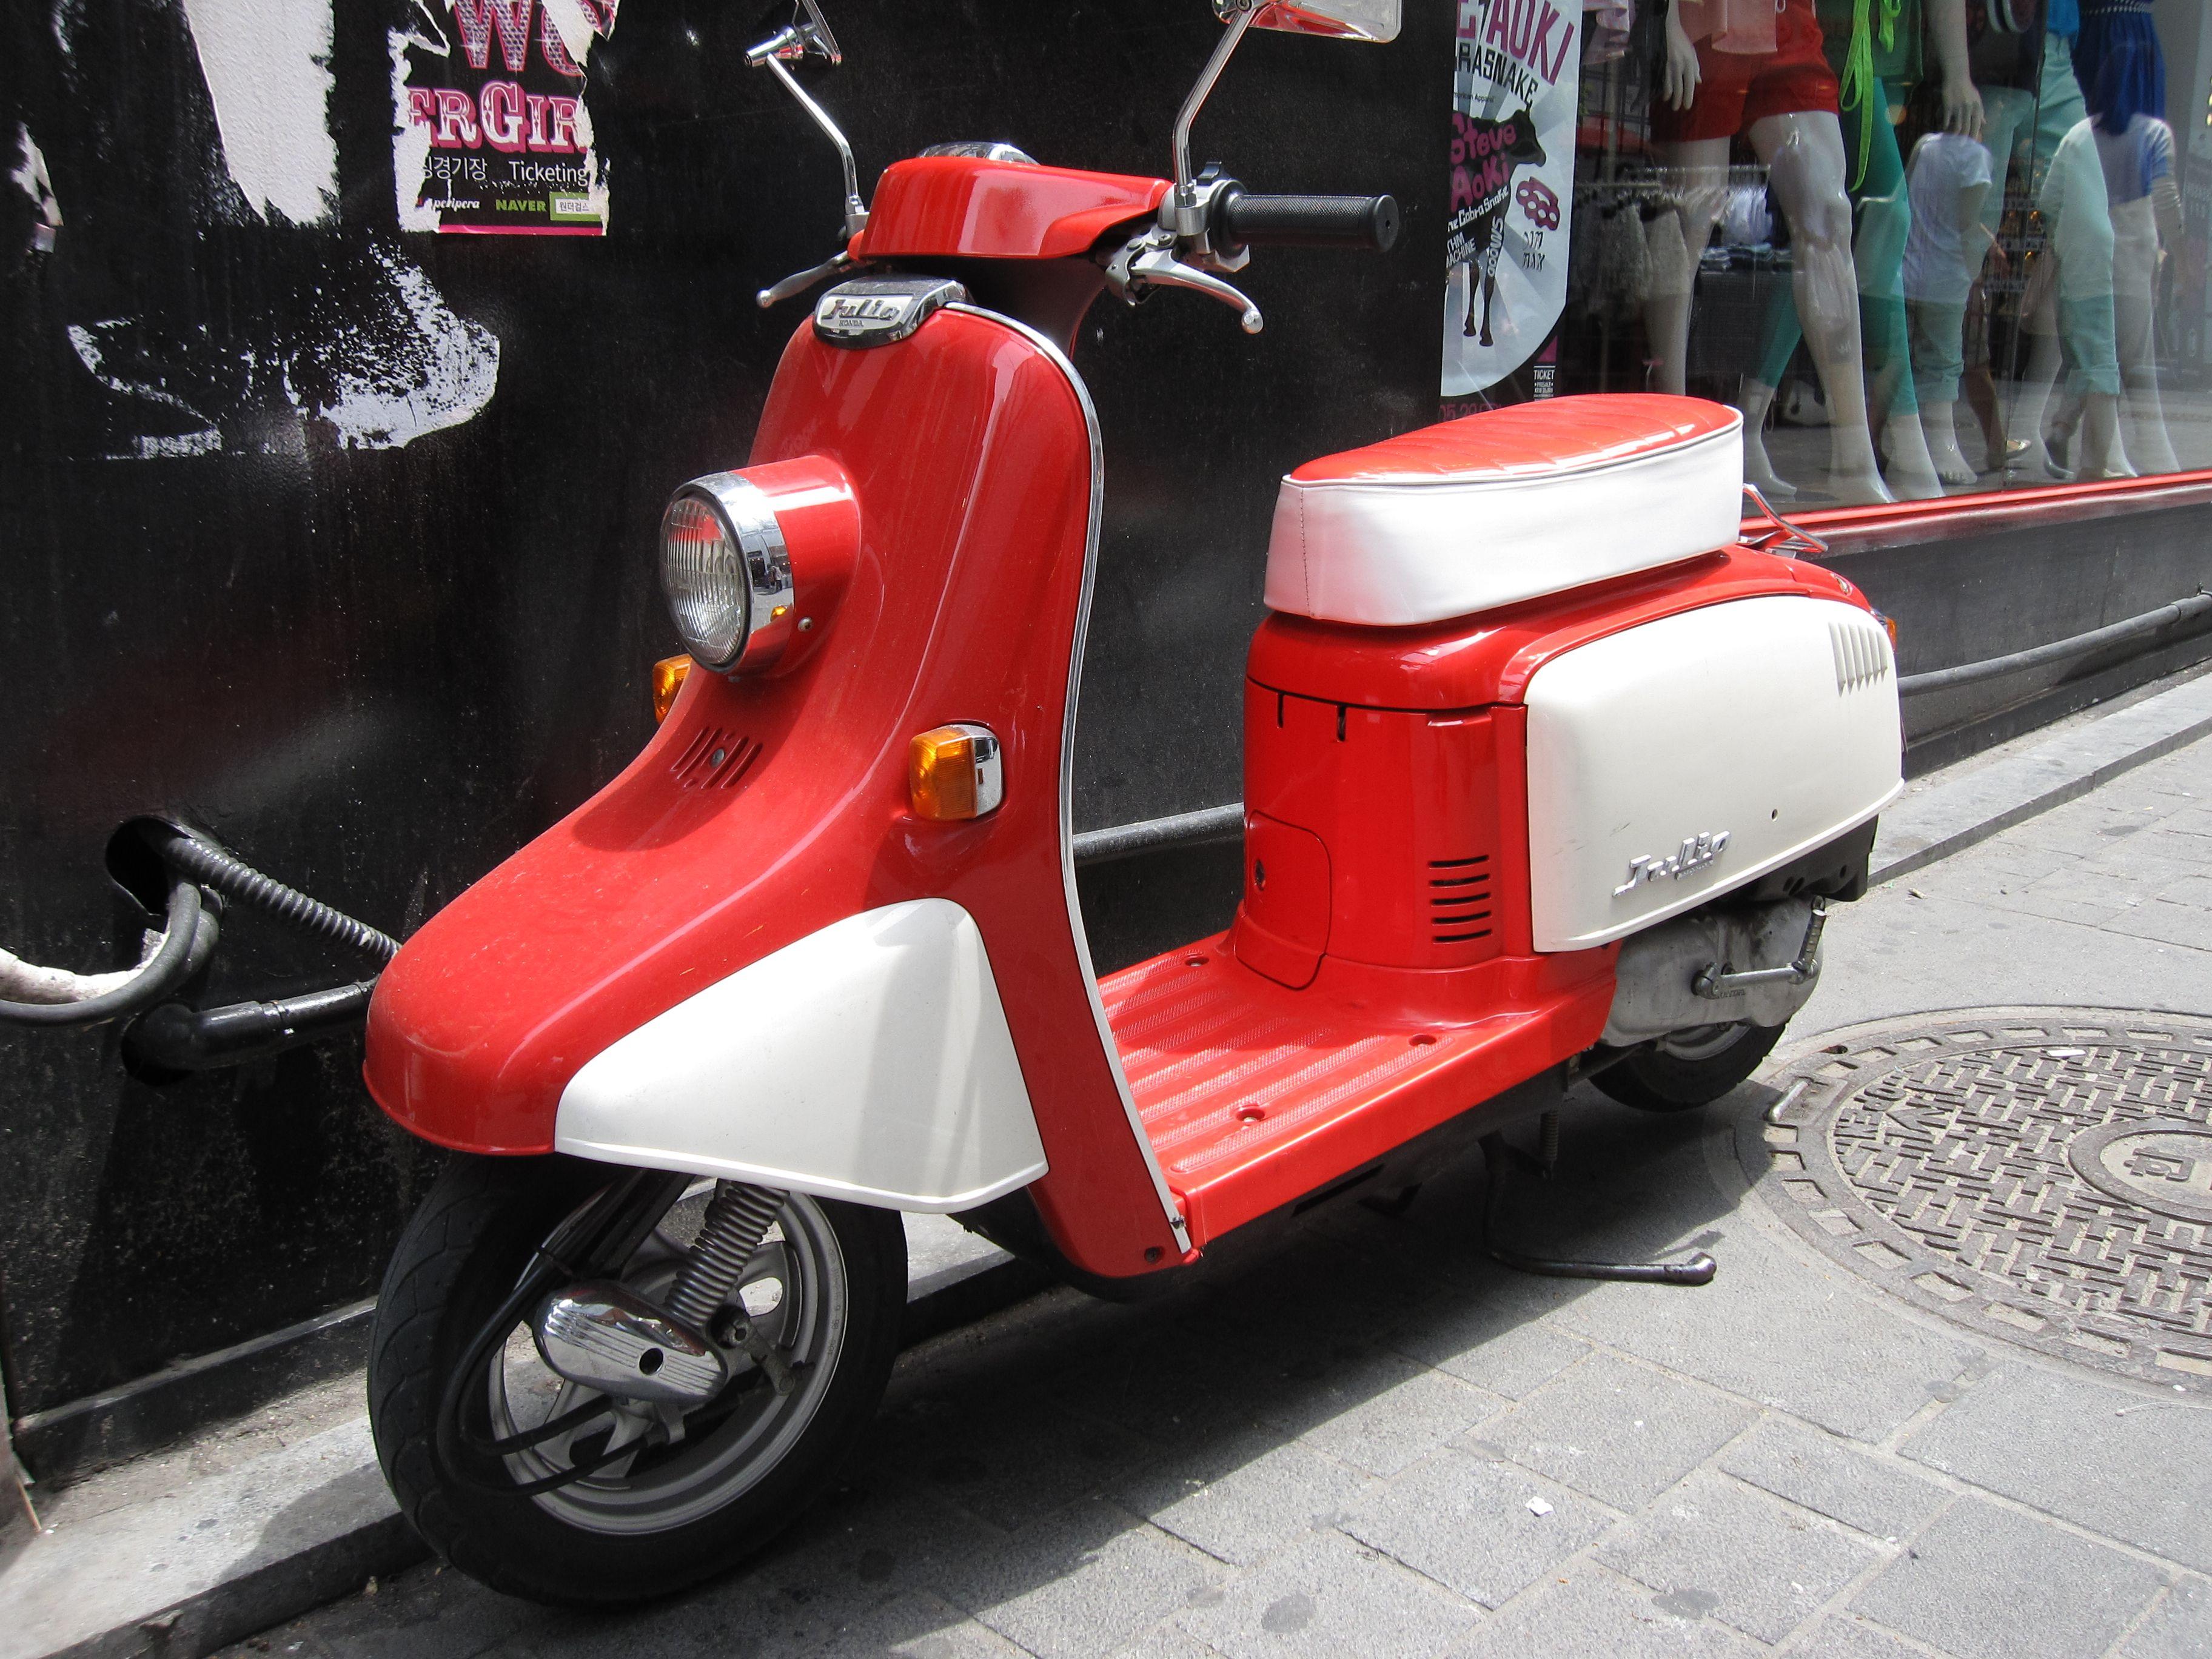 Beautiful 1998 Honda Julio scooter 50cc